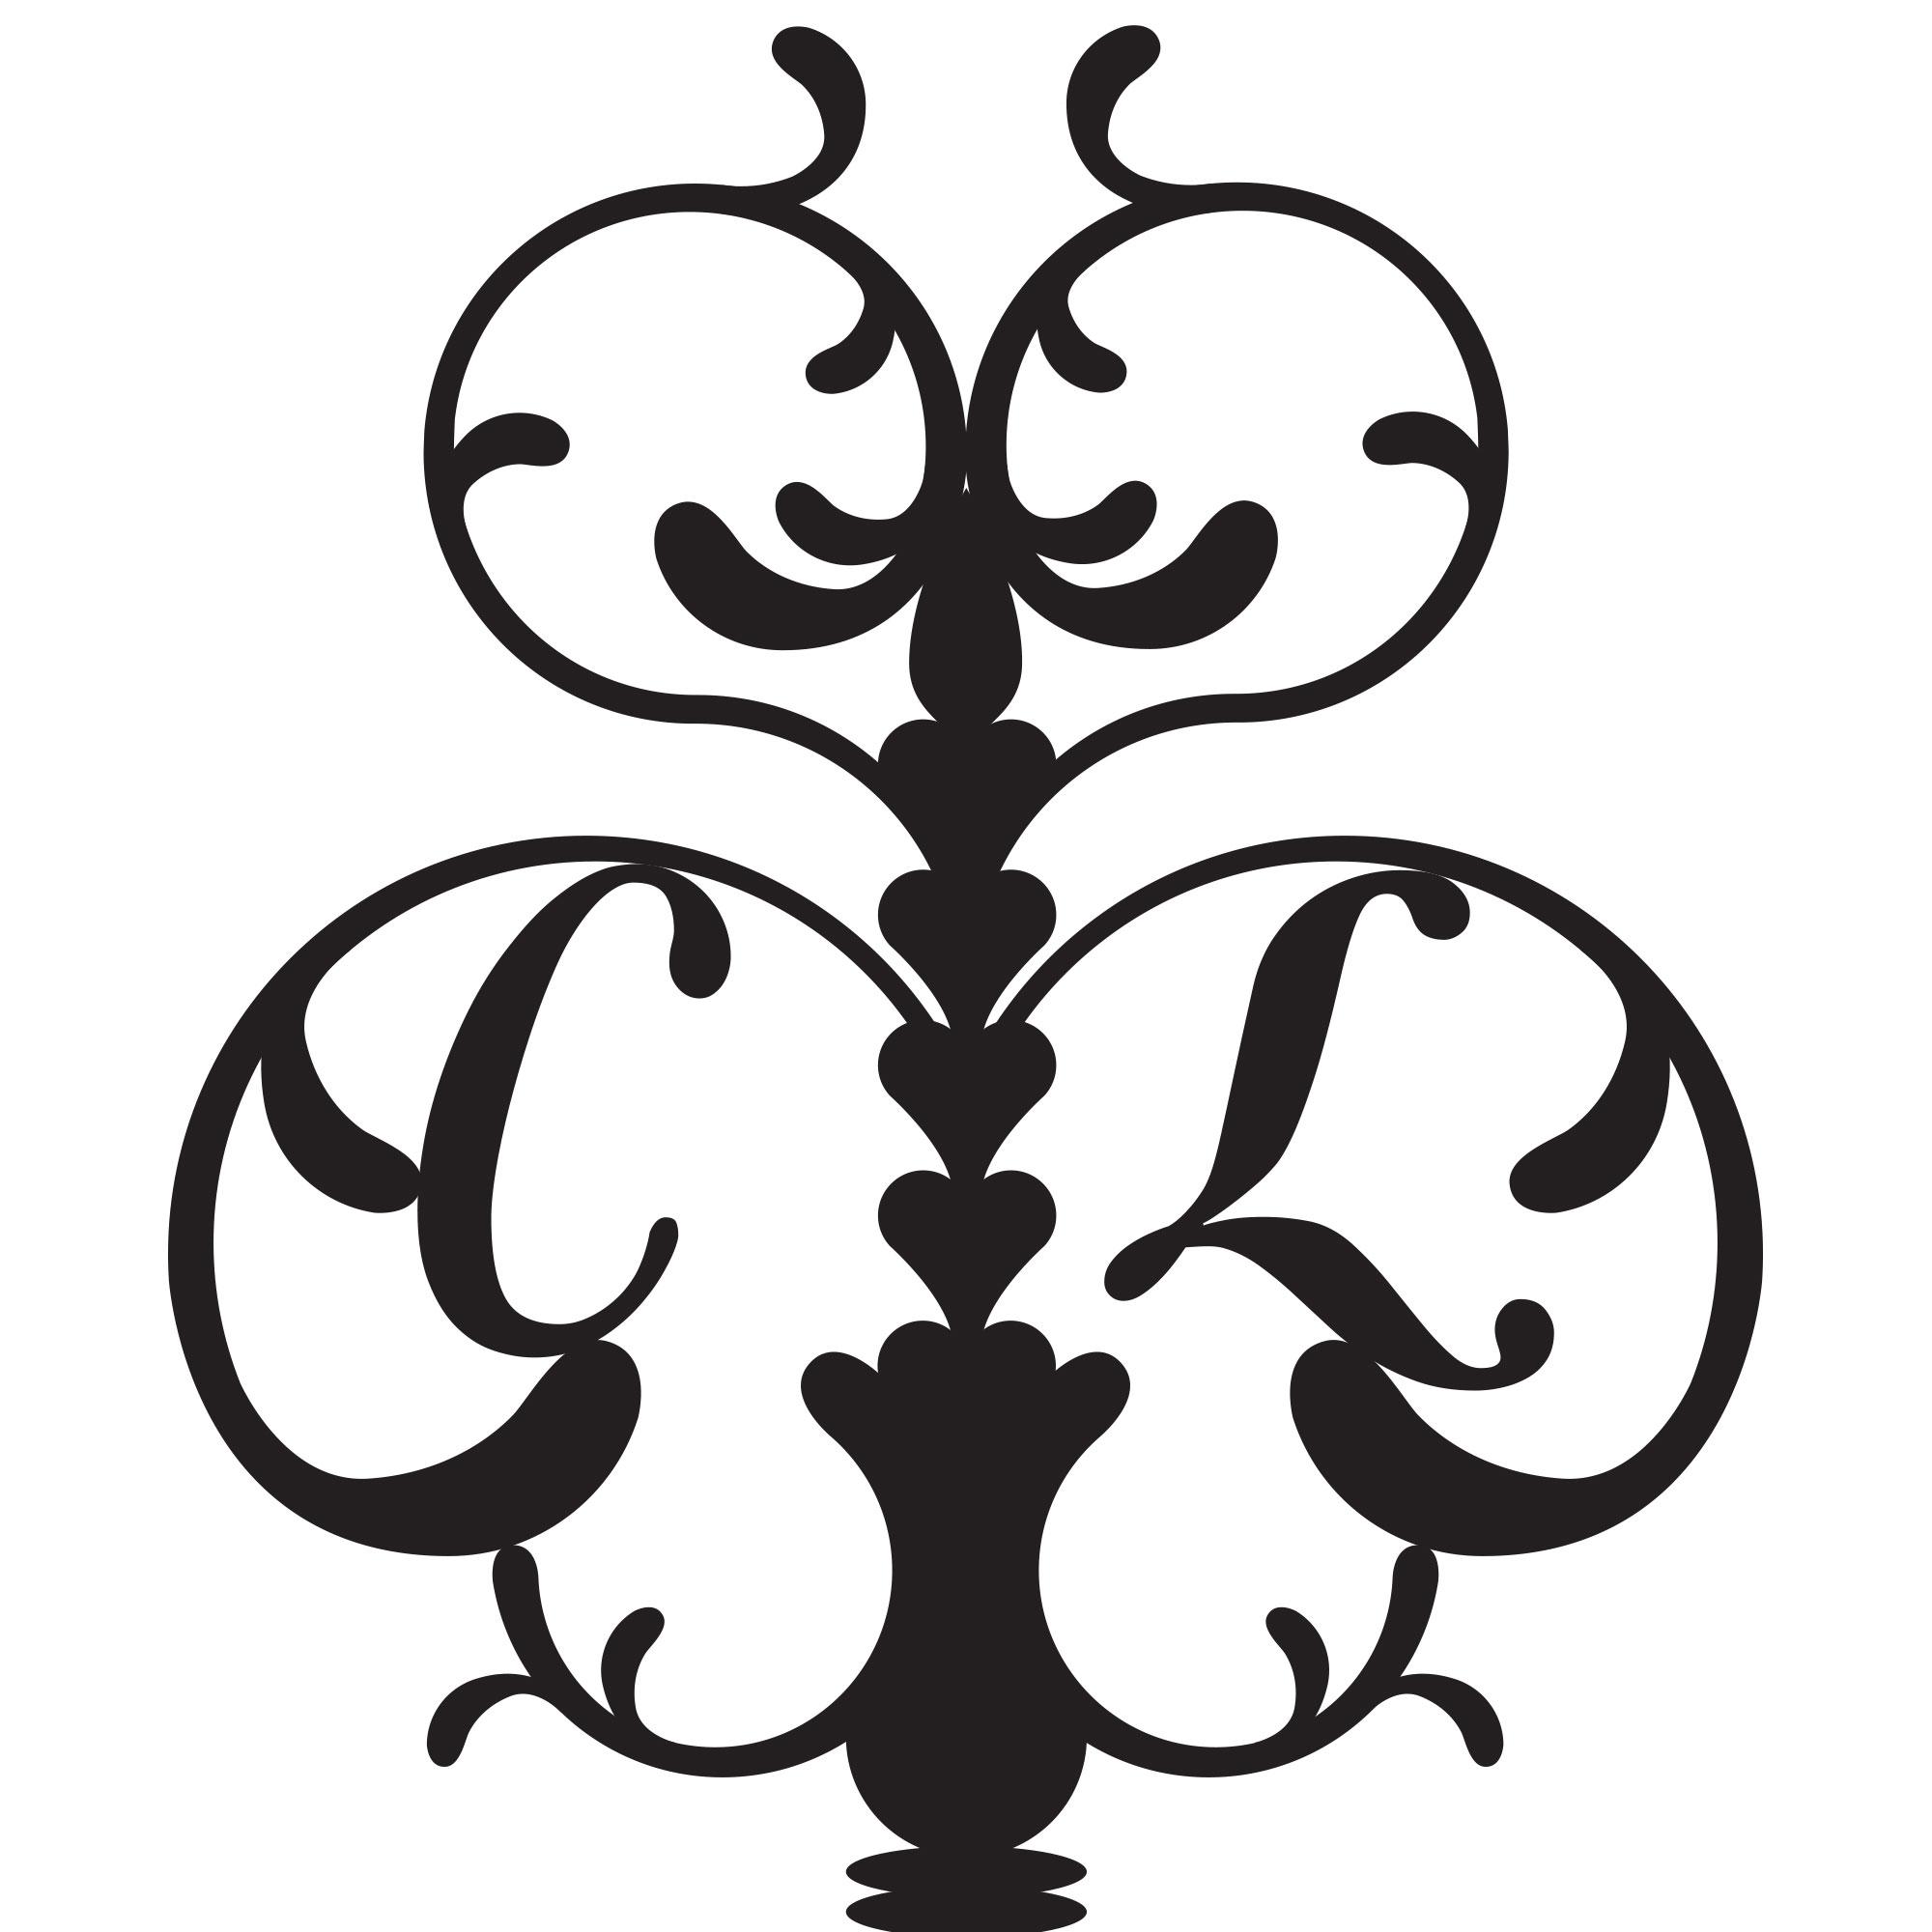 dessine-moi un tatouage - fanny contu - cv